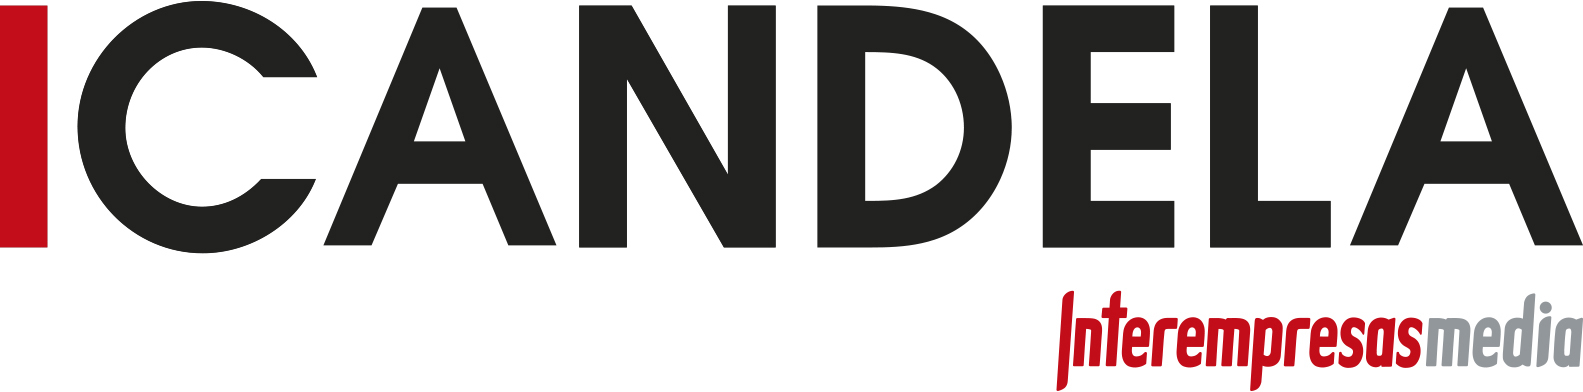 ICANDELA, (open link in a new window)